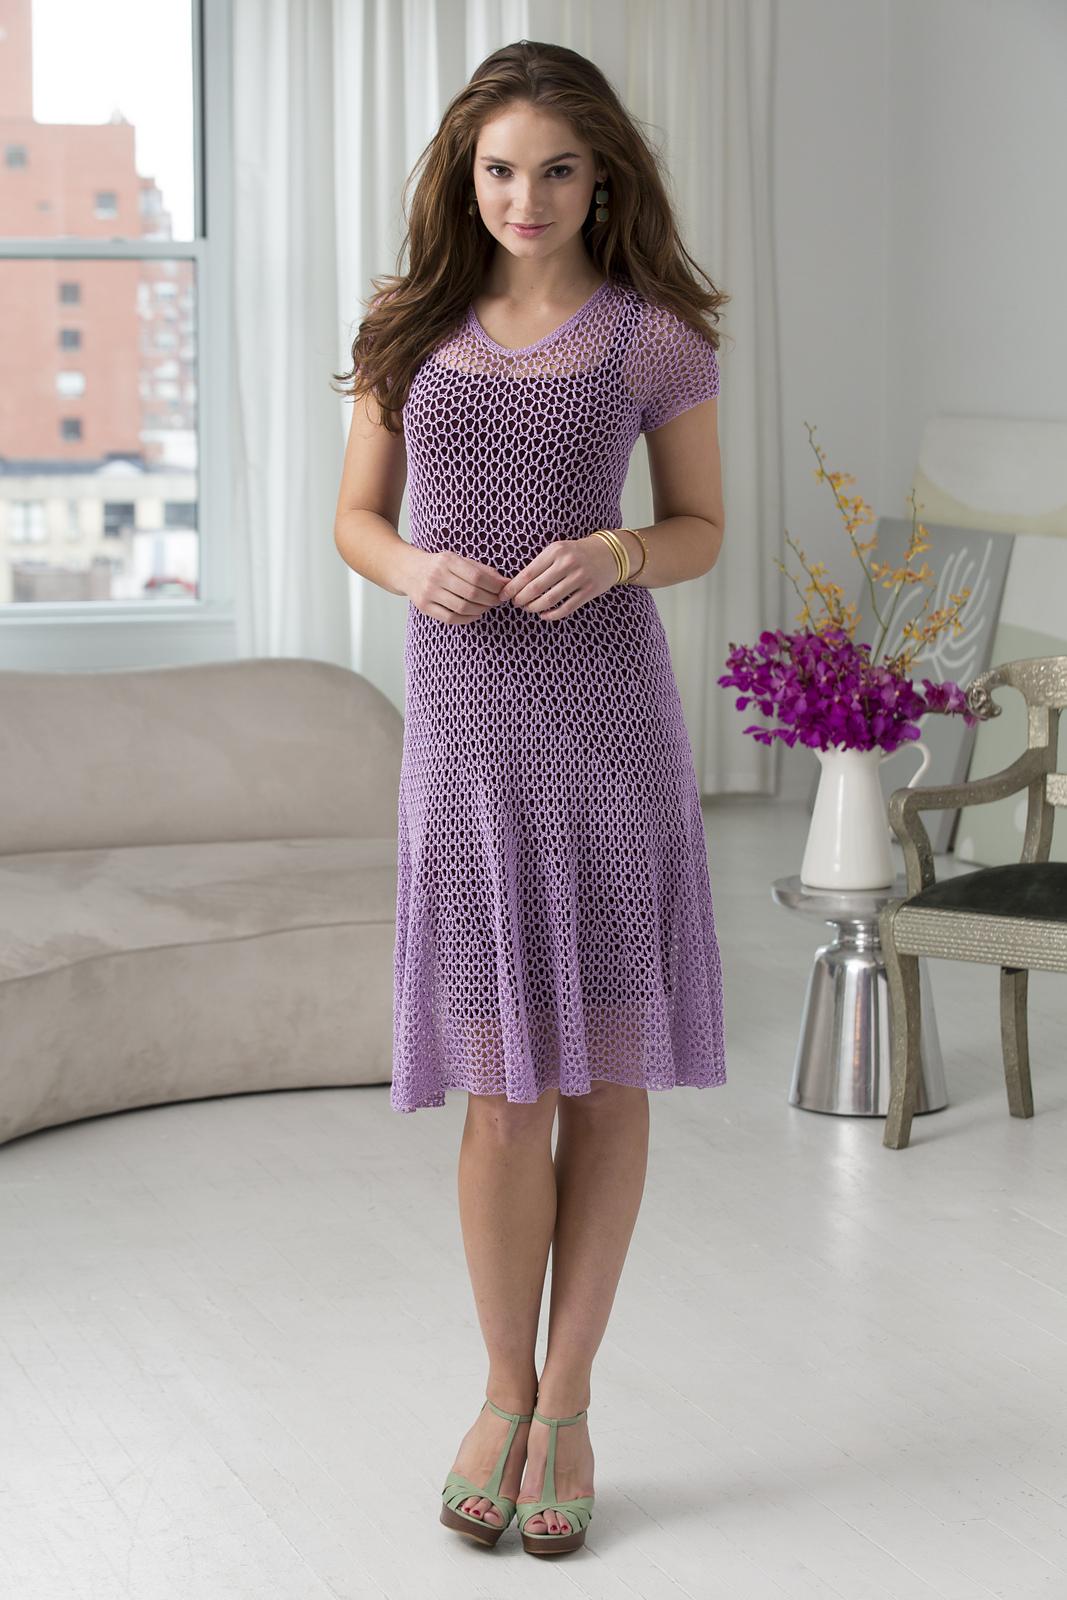 55-cool-and-stylish-crochet-dresses-pattern-design-ideas